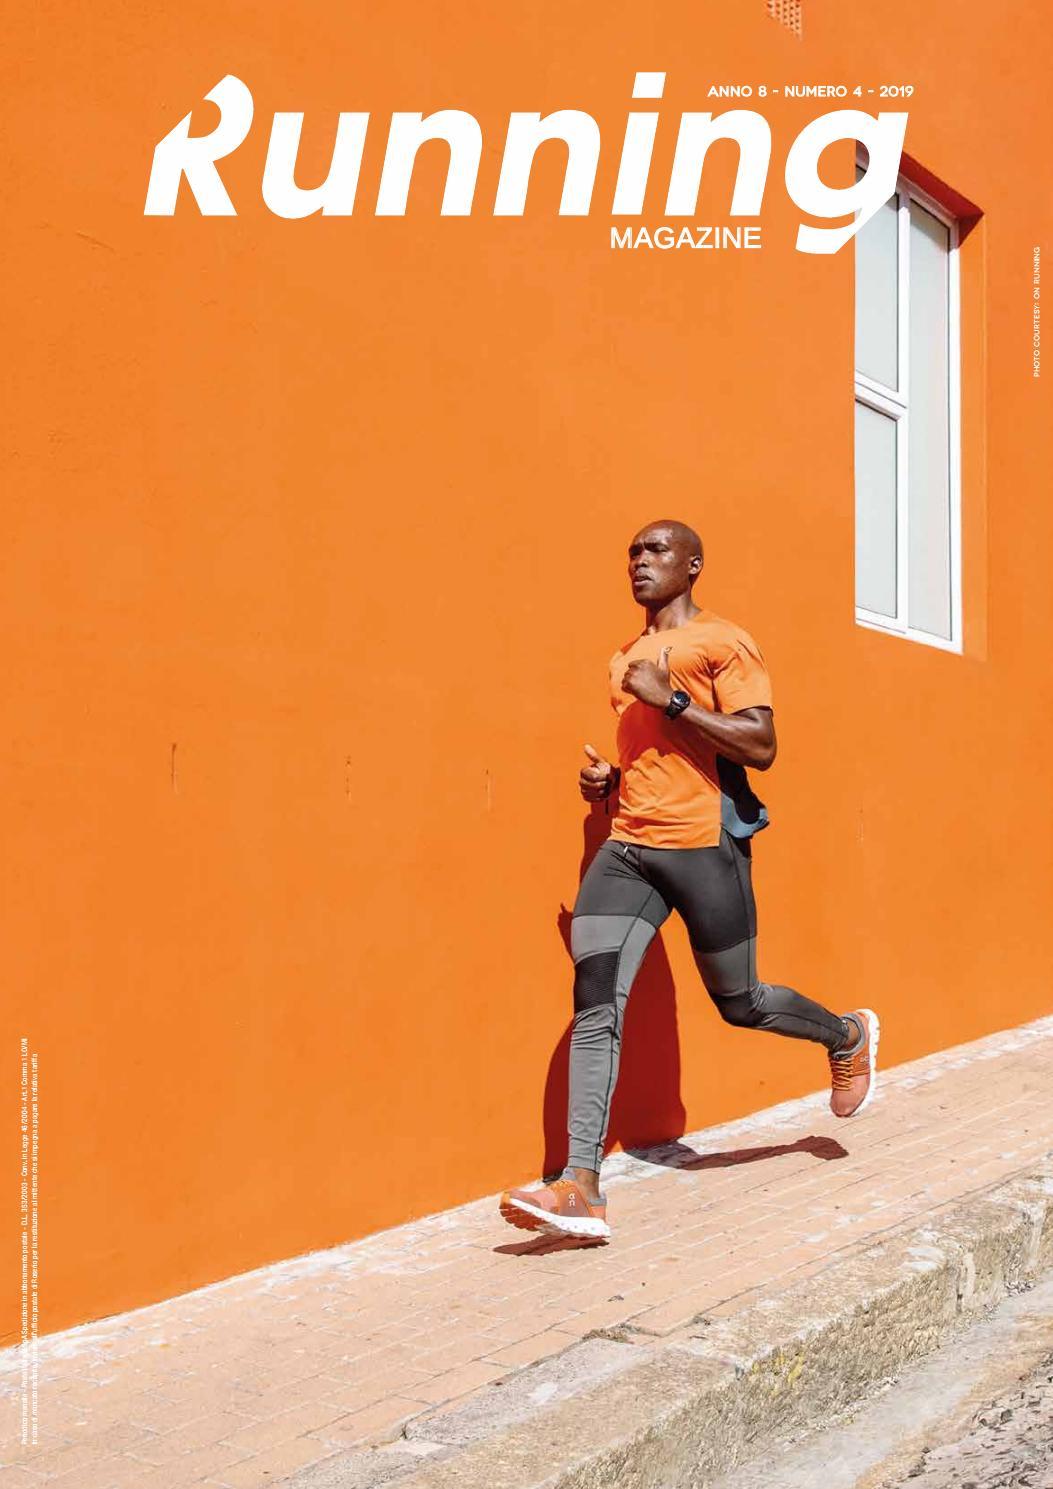 Running Magazine 4 2019 by Sport Press issuu